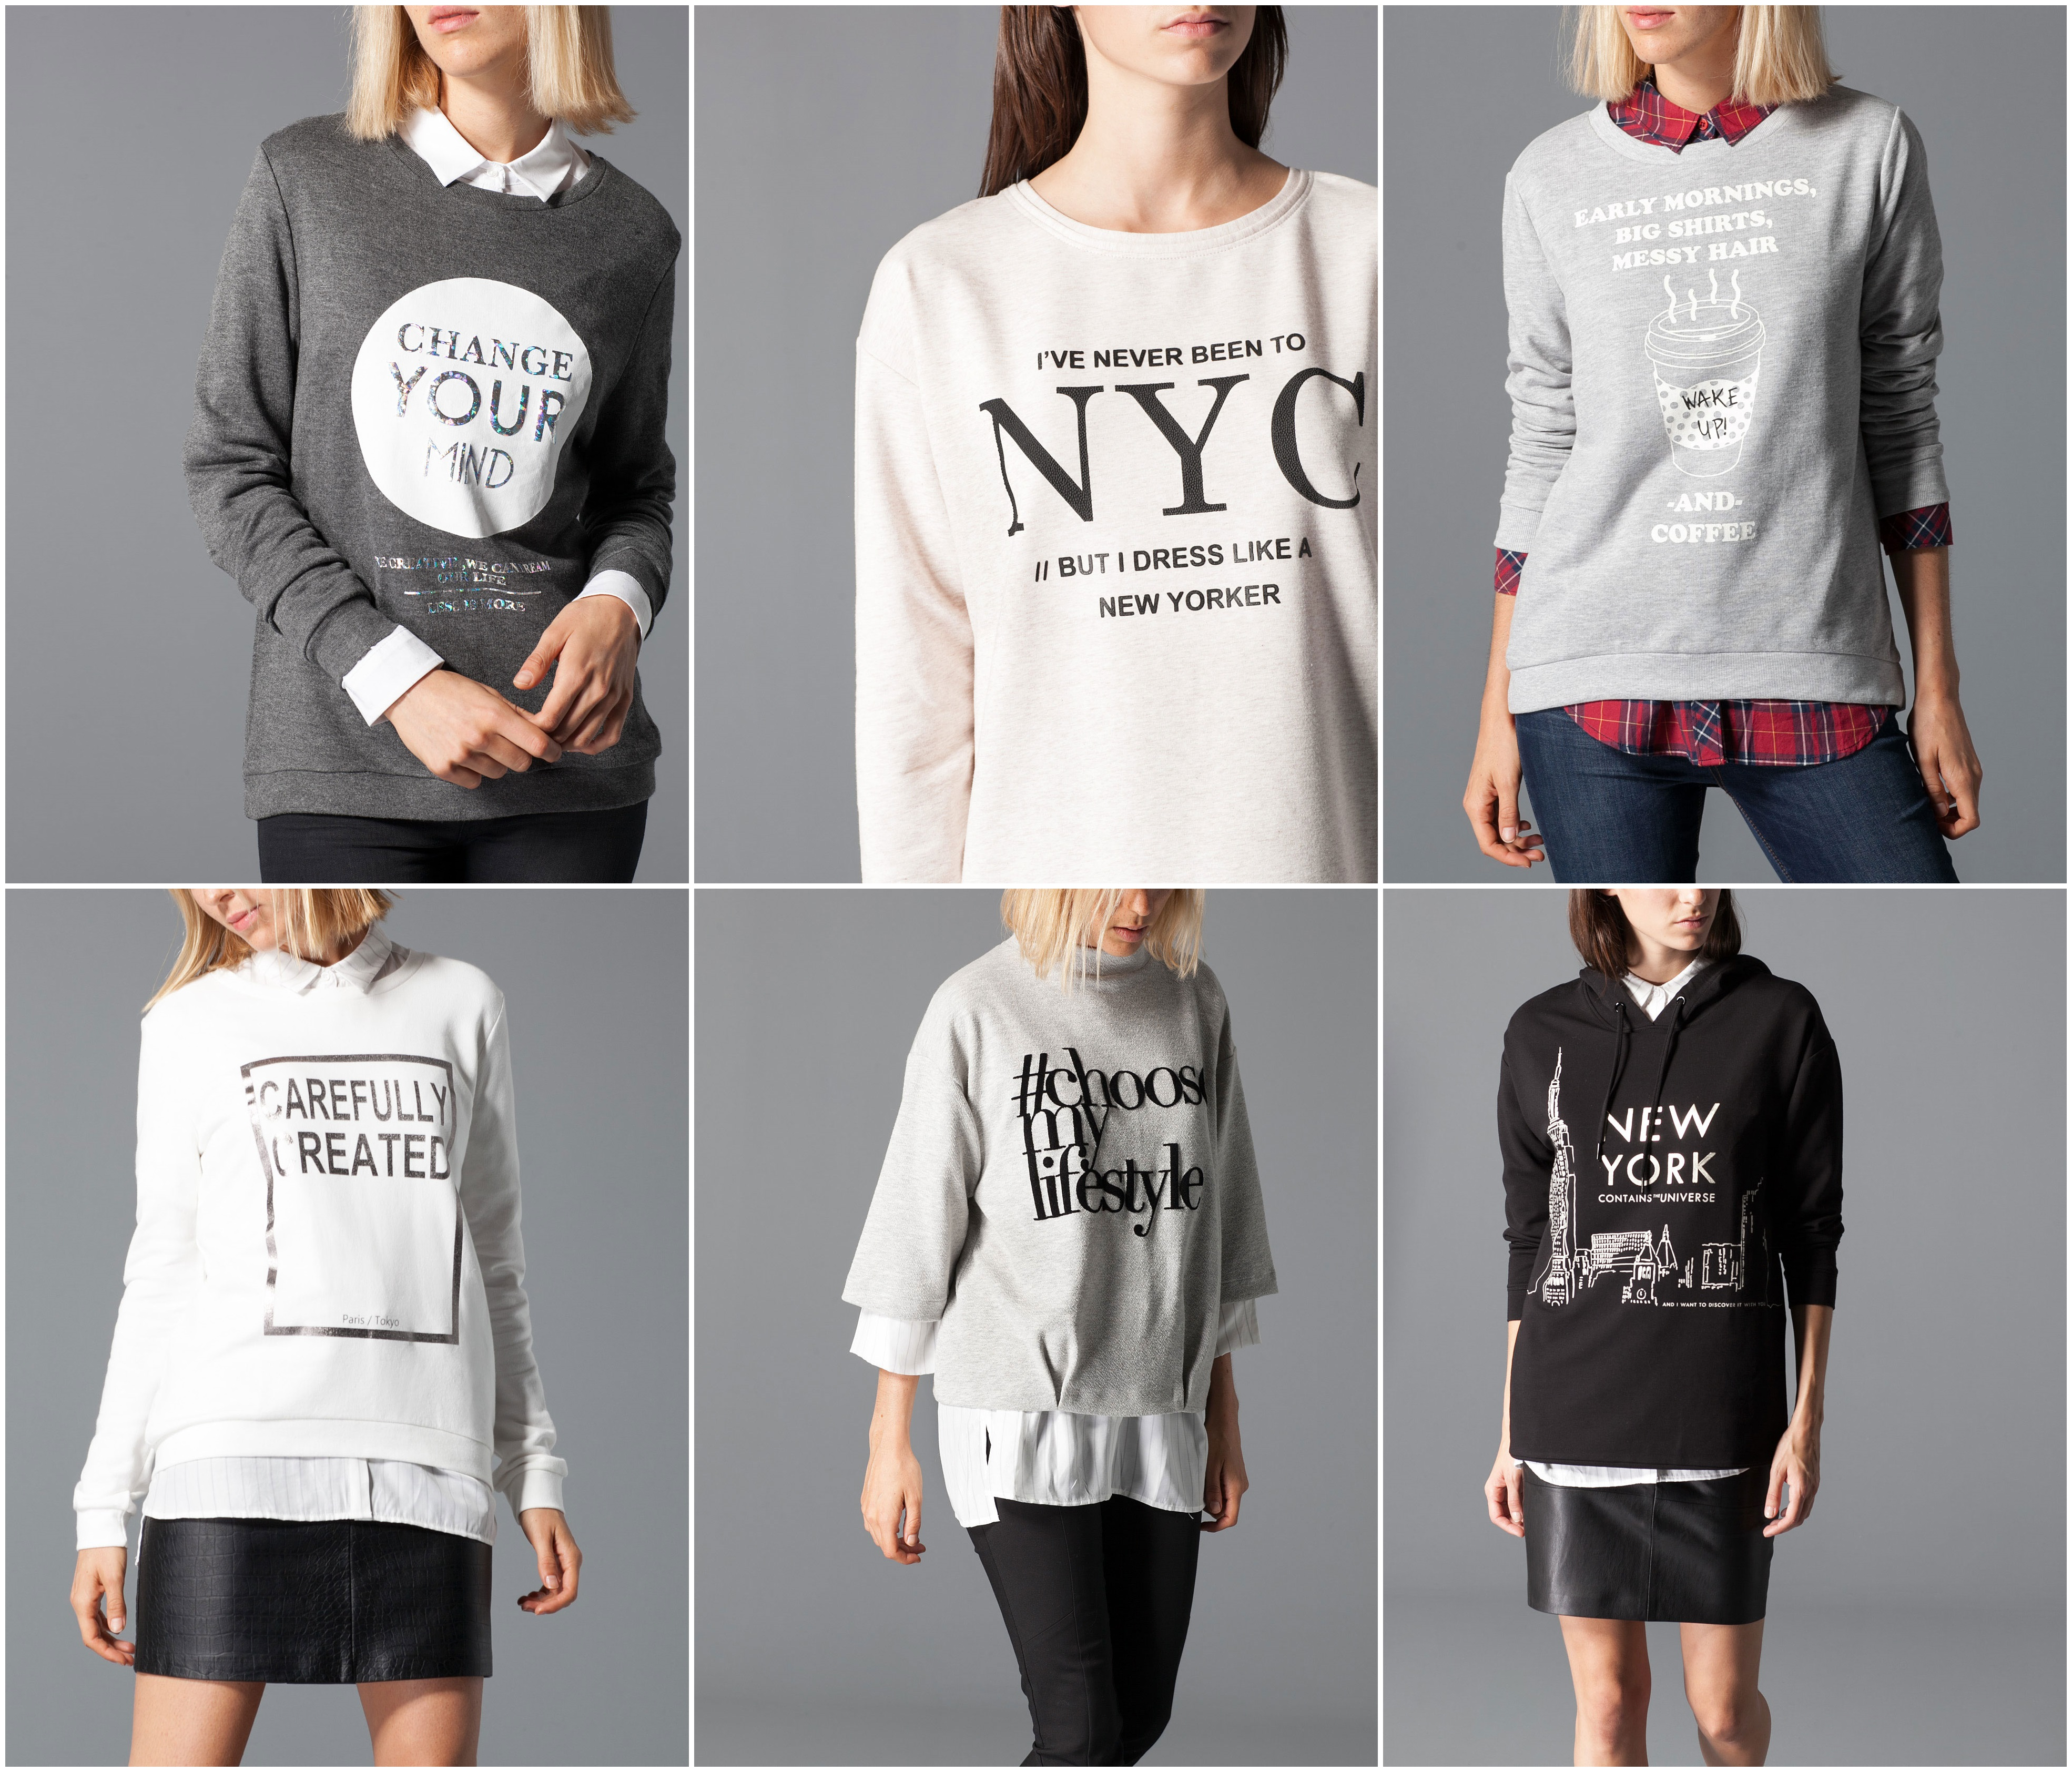 sudaderas-sweatshirts-stradivarius-otoño-2014